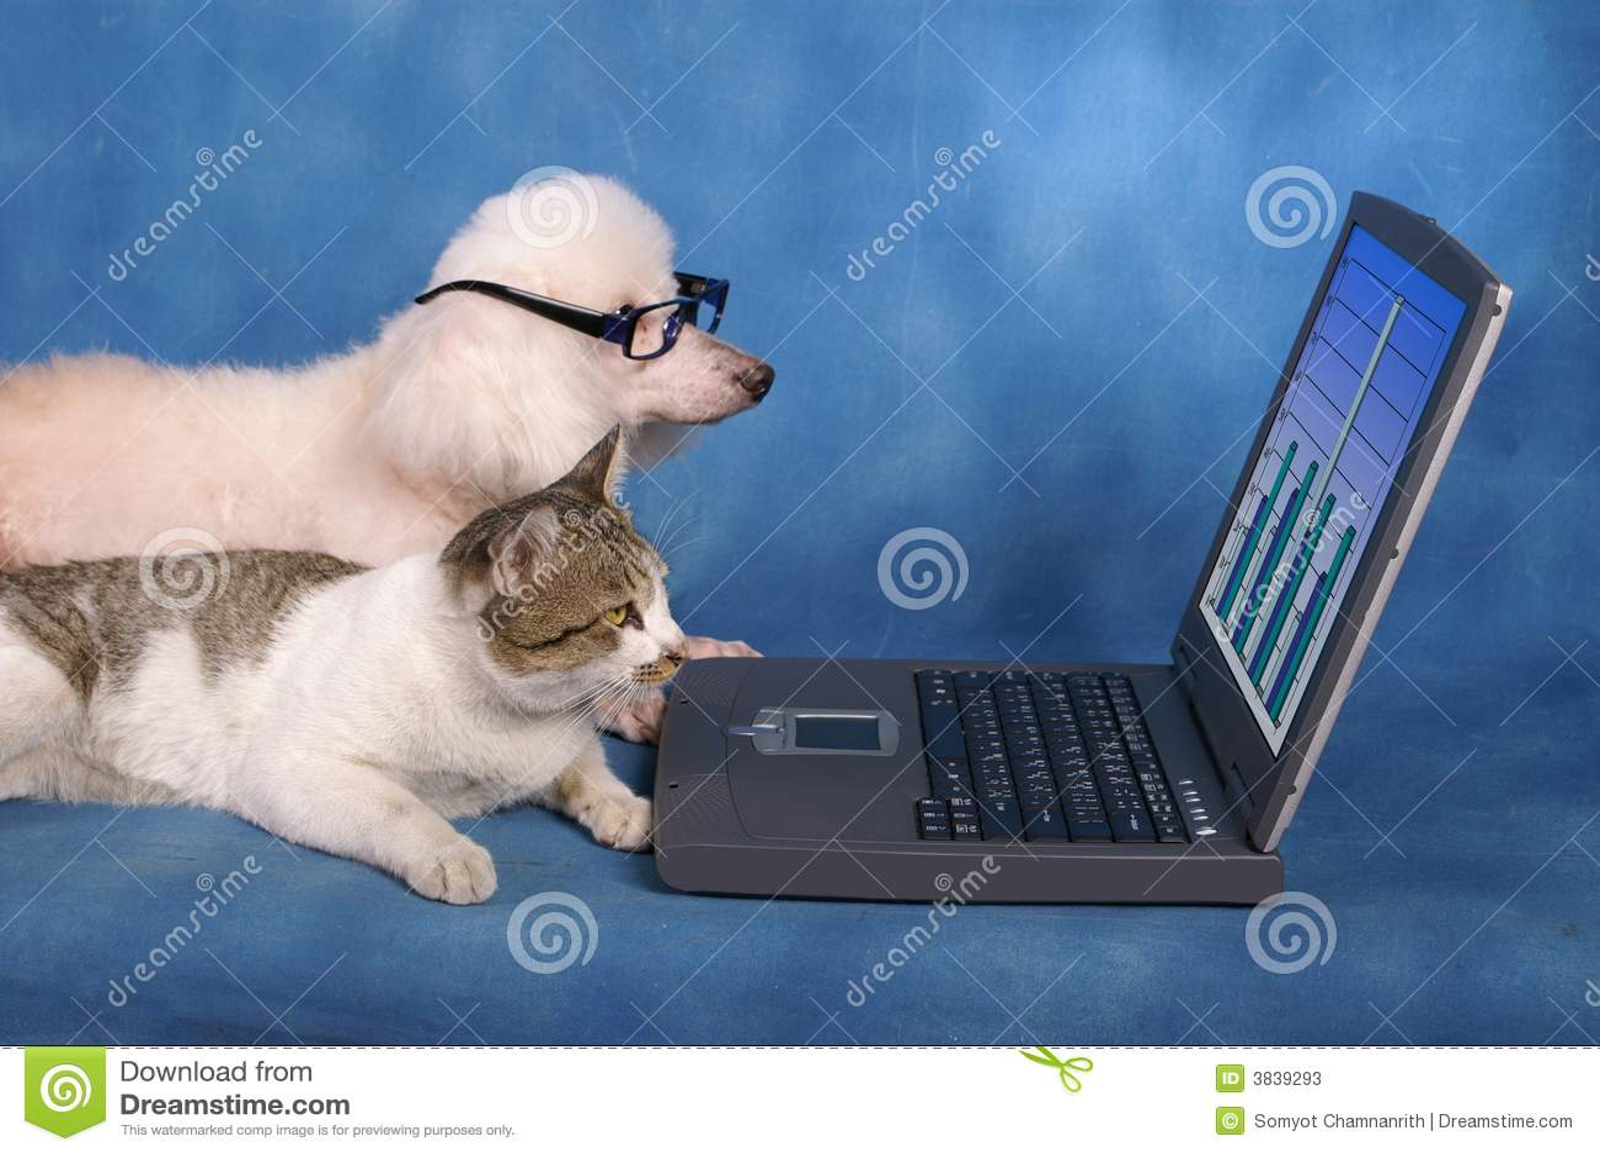 Business pets